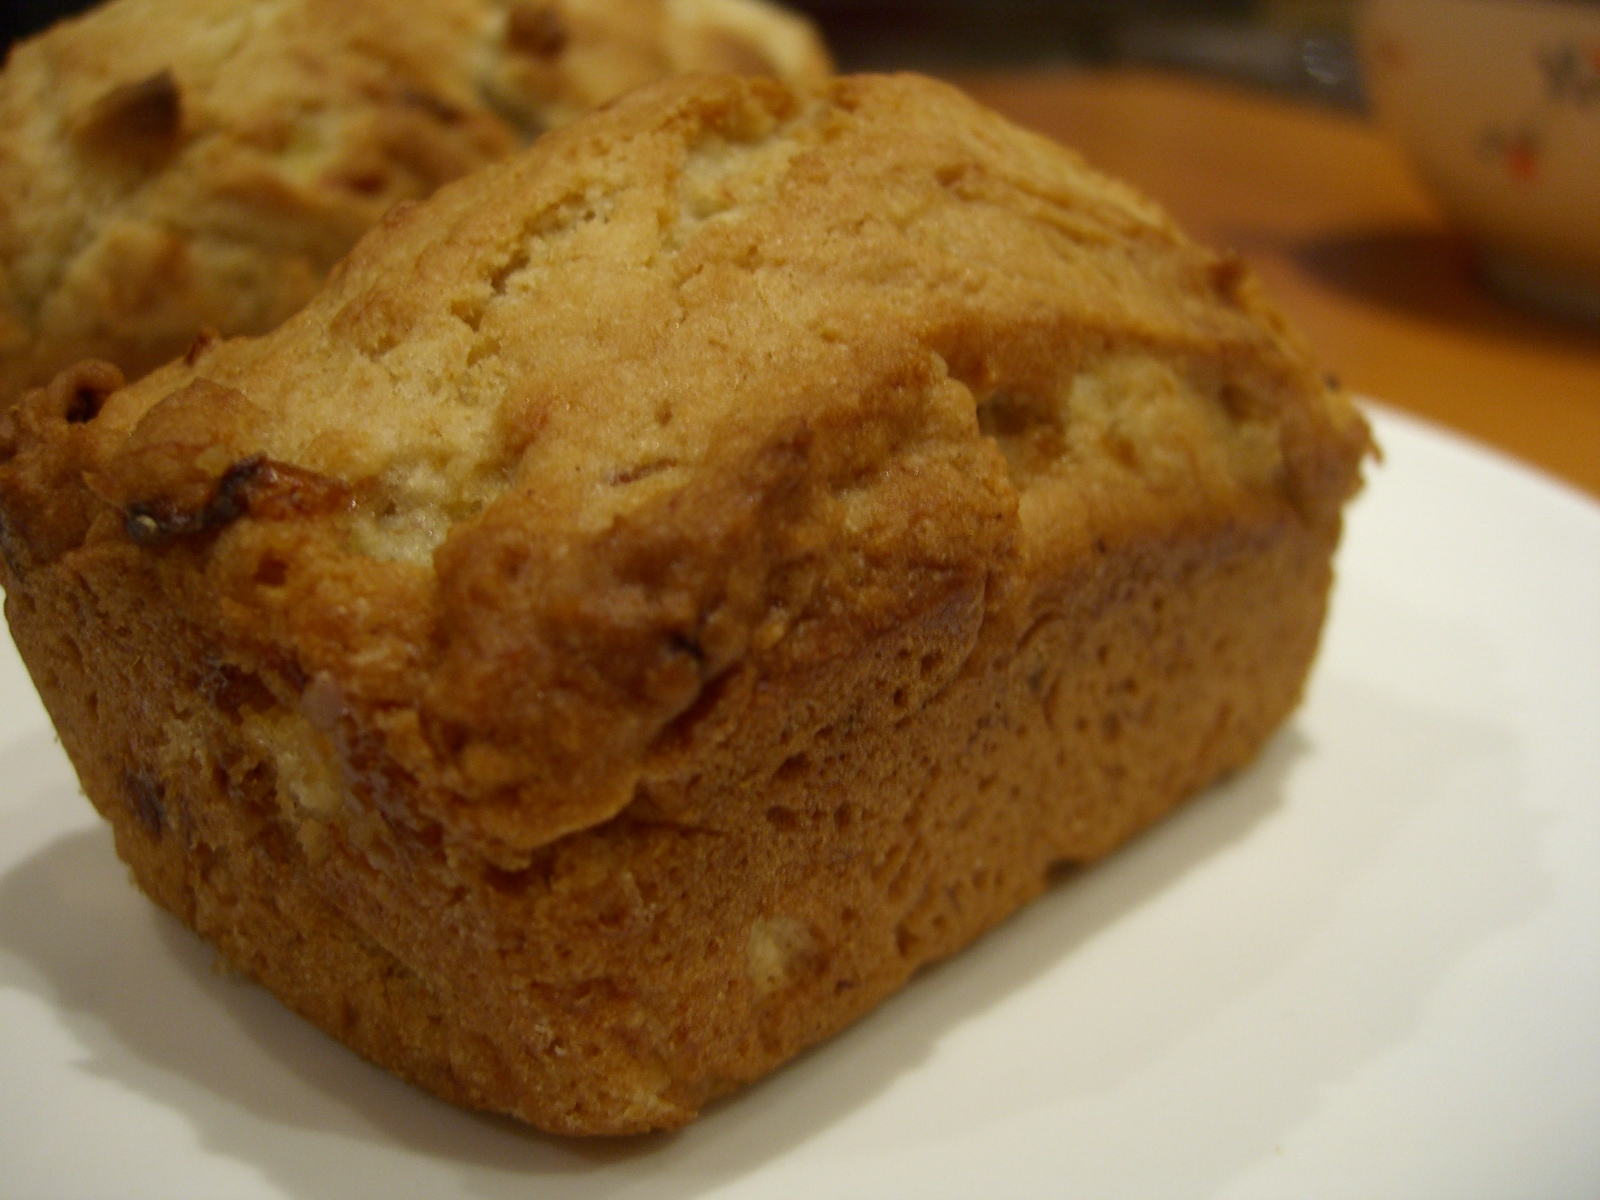 Weight Watchers Healthy Banana Bread recipe